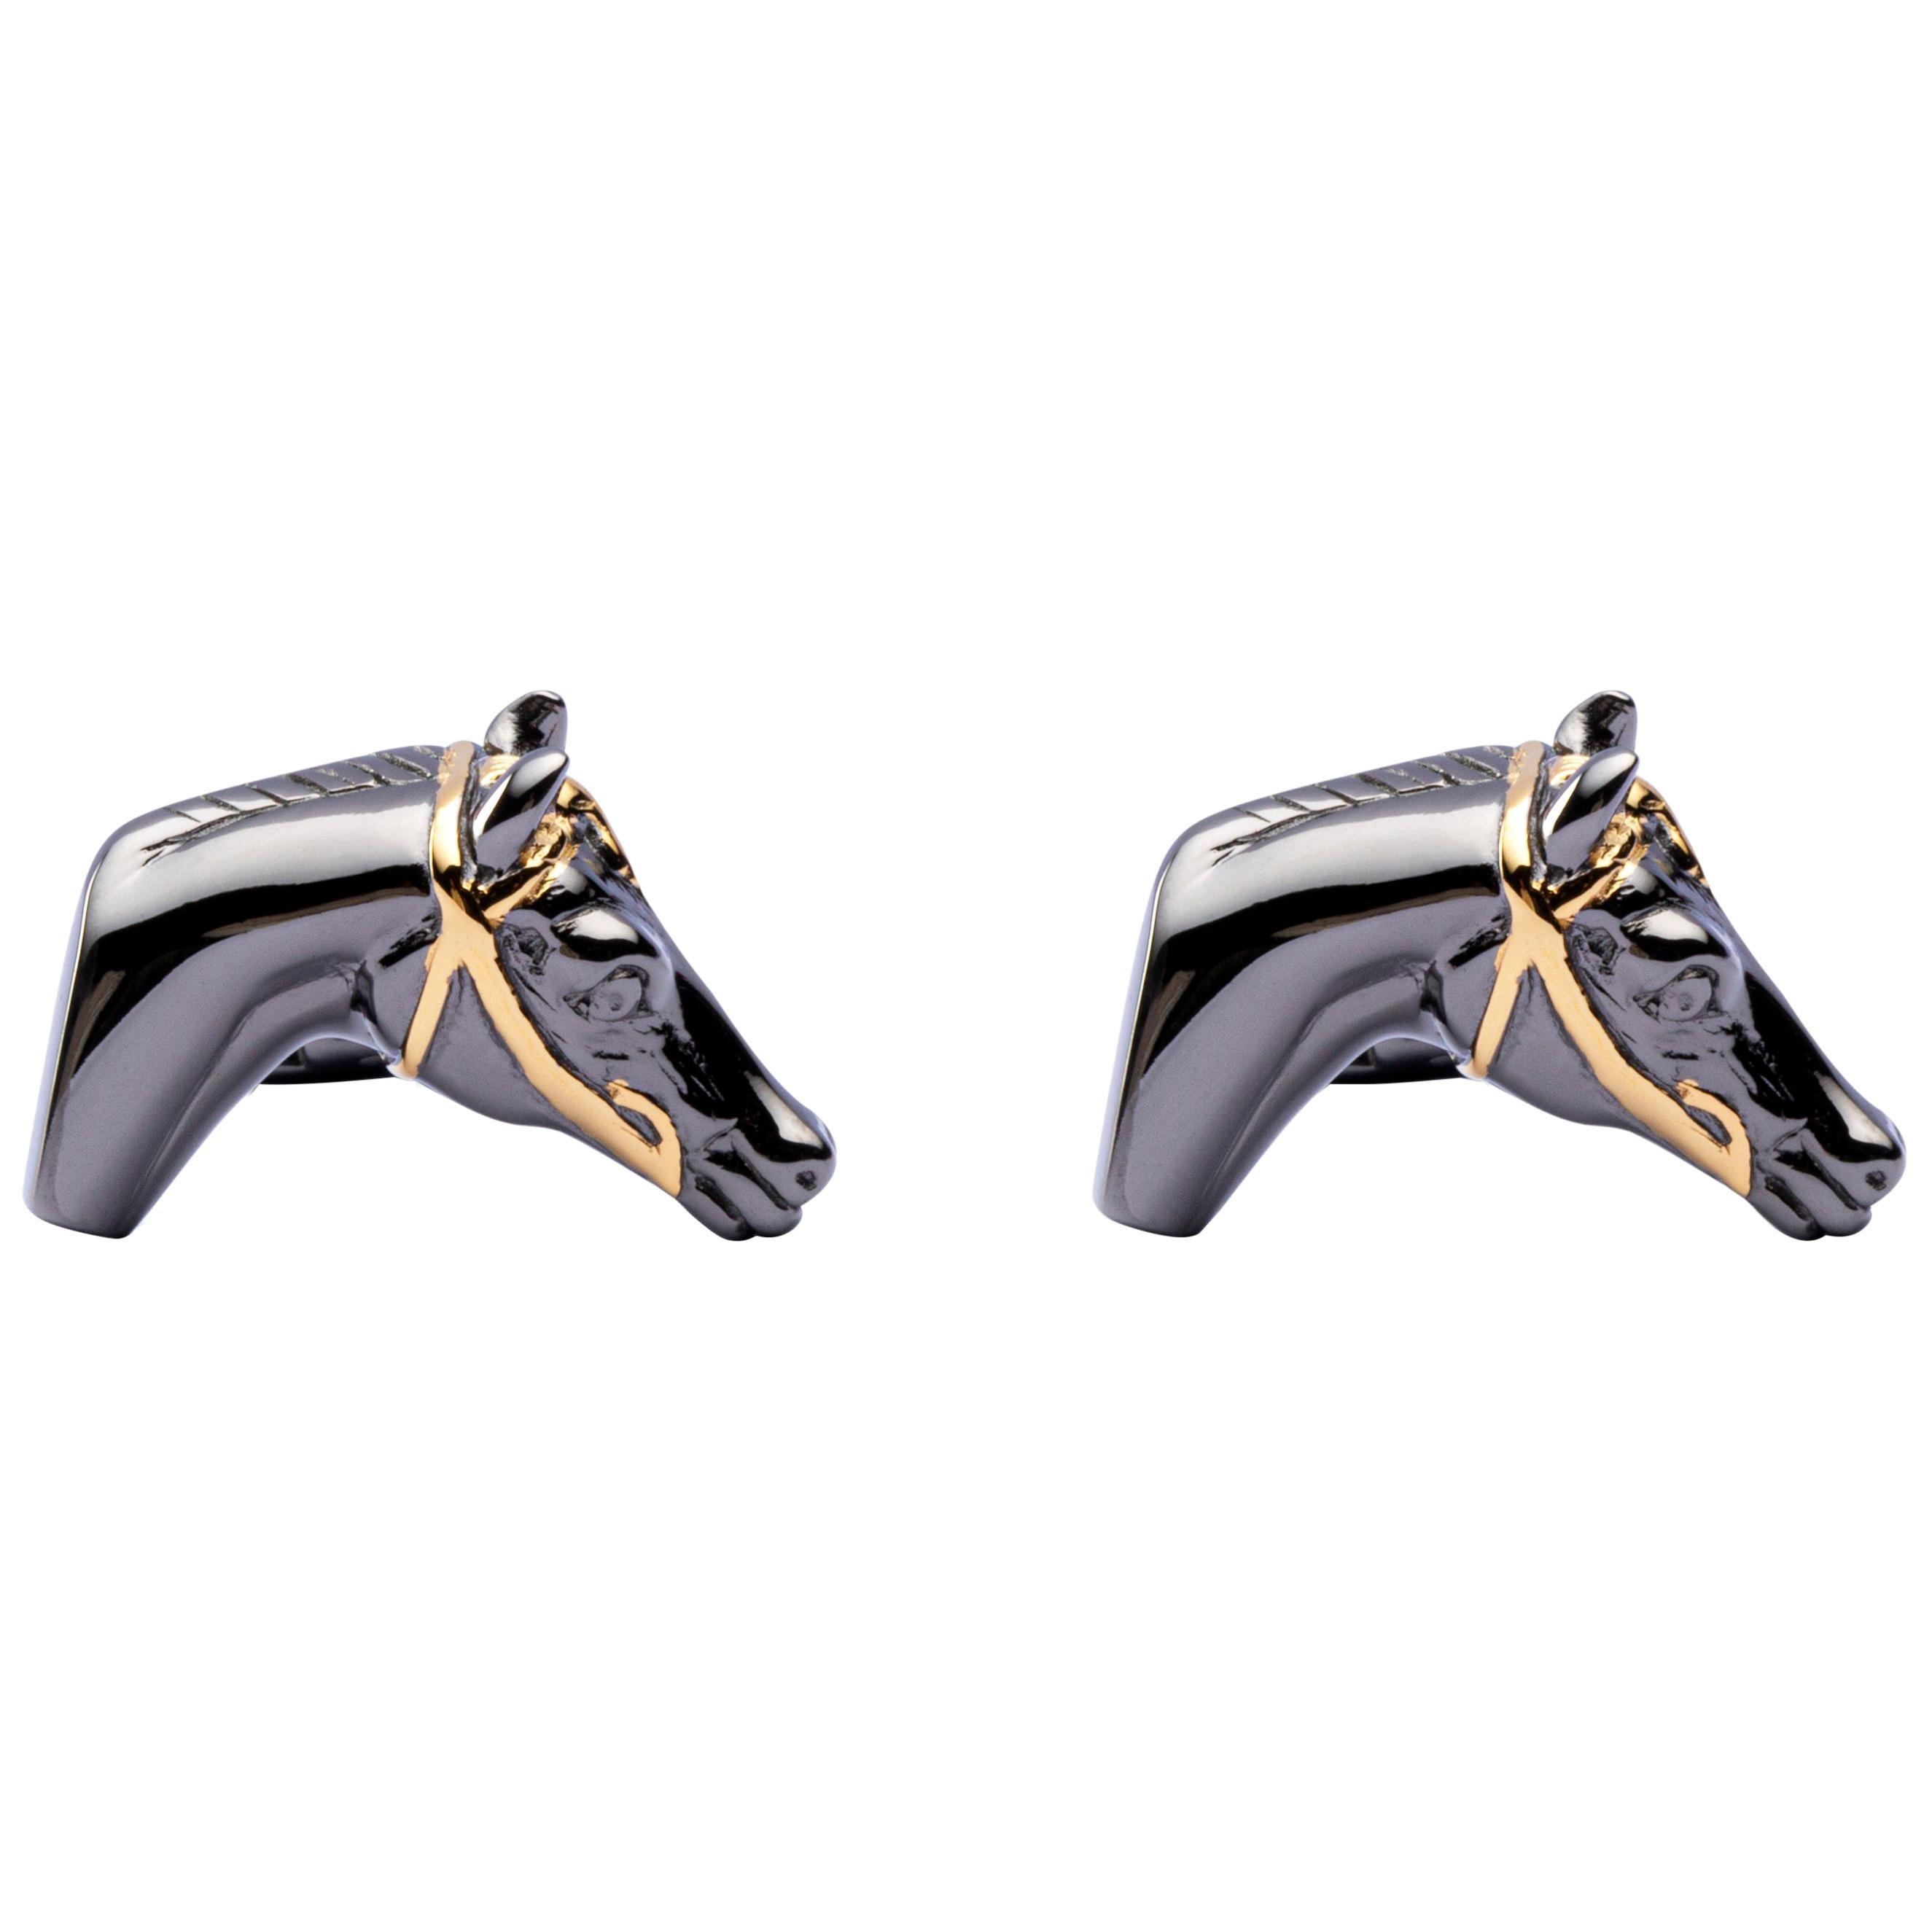 Jona Sterling Silver Horse Head Equestrian Cufflinks